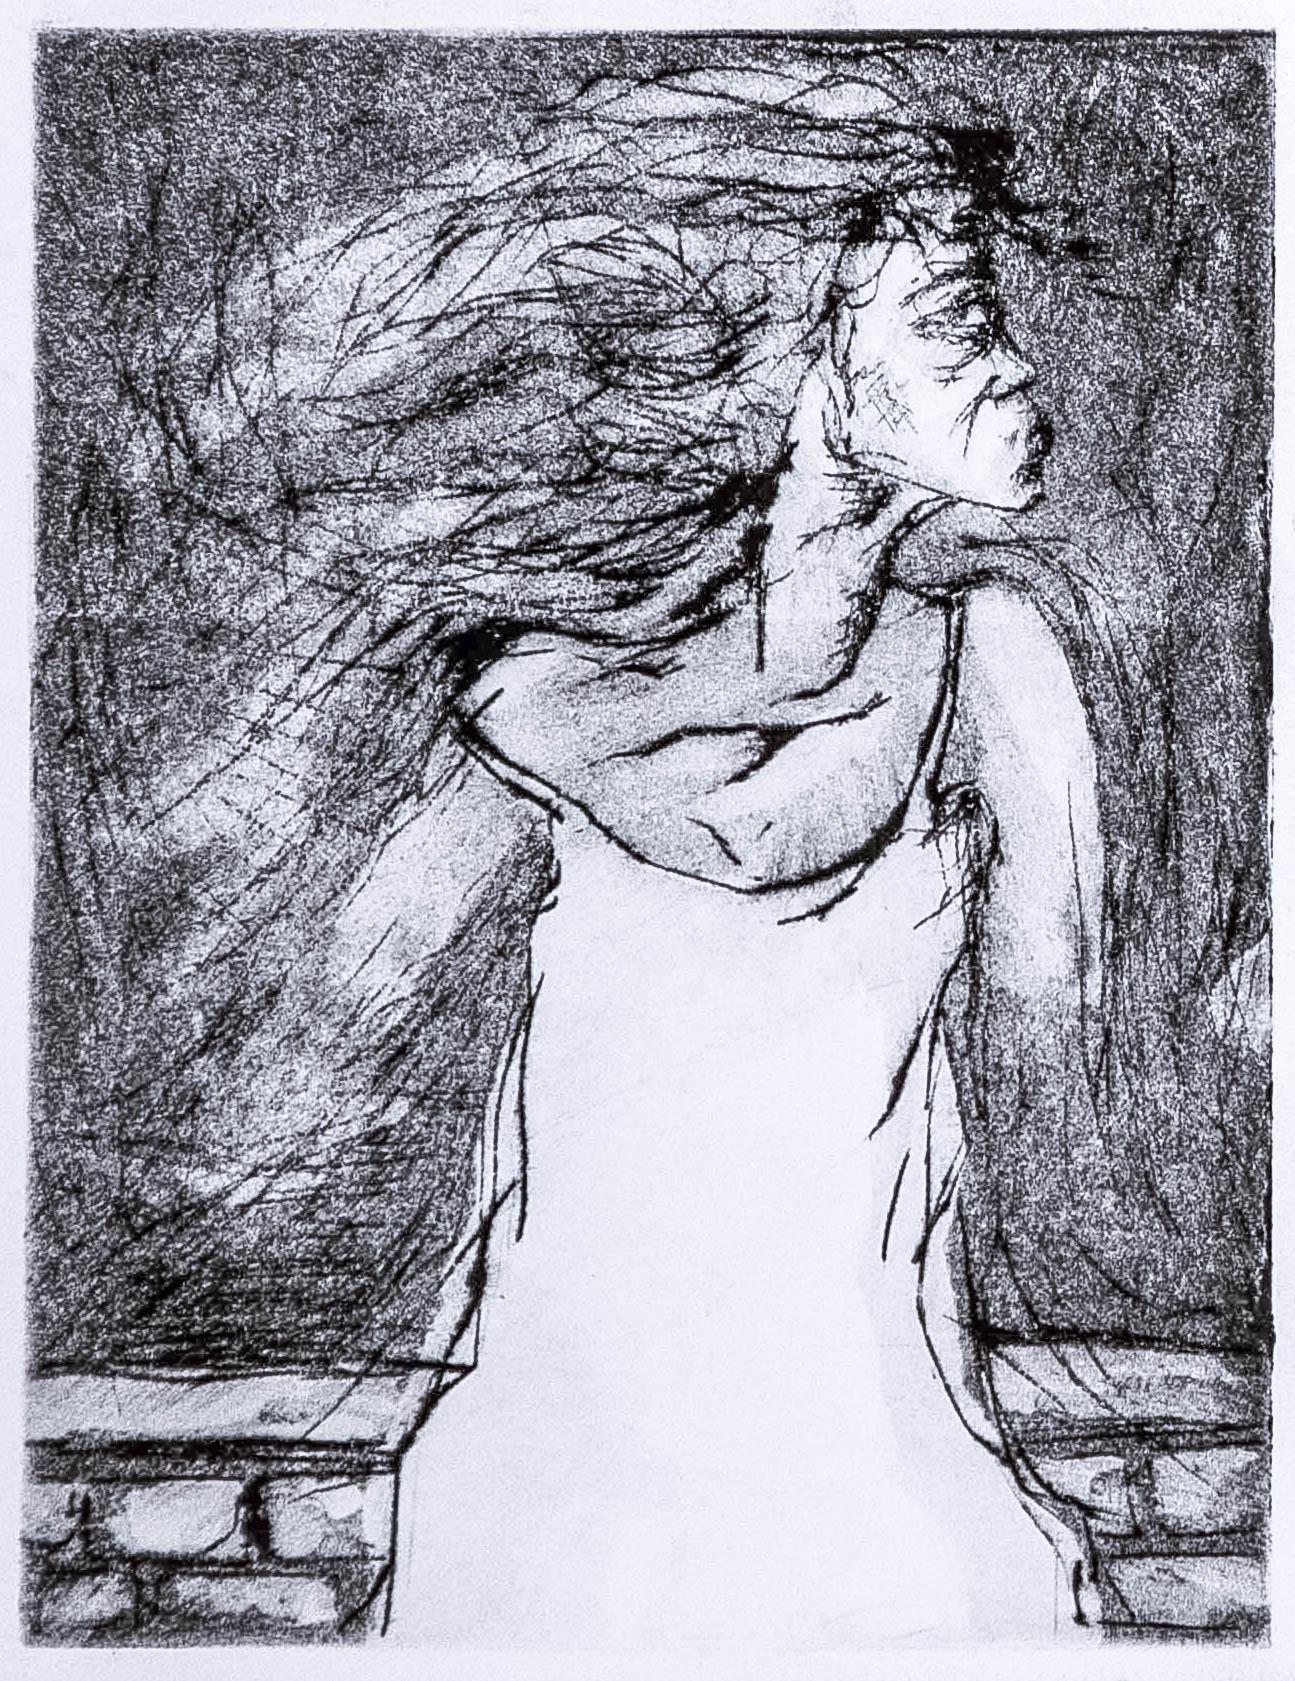 Regina Viqueira, Disappearing woman, 2013, intaglio print